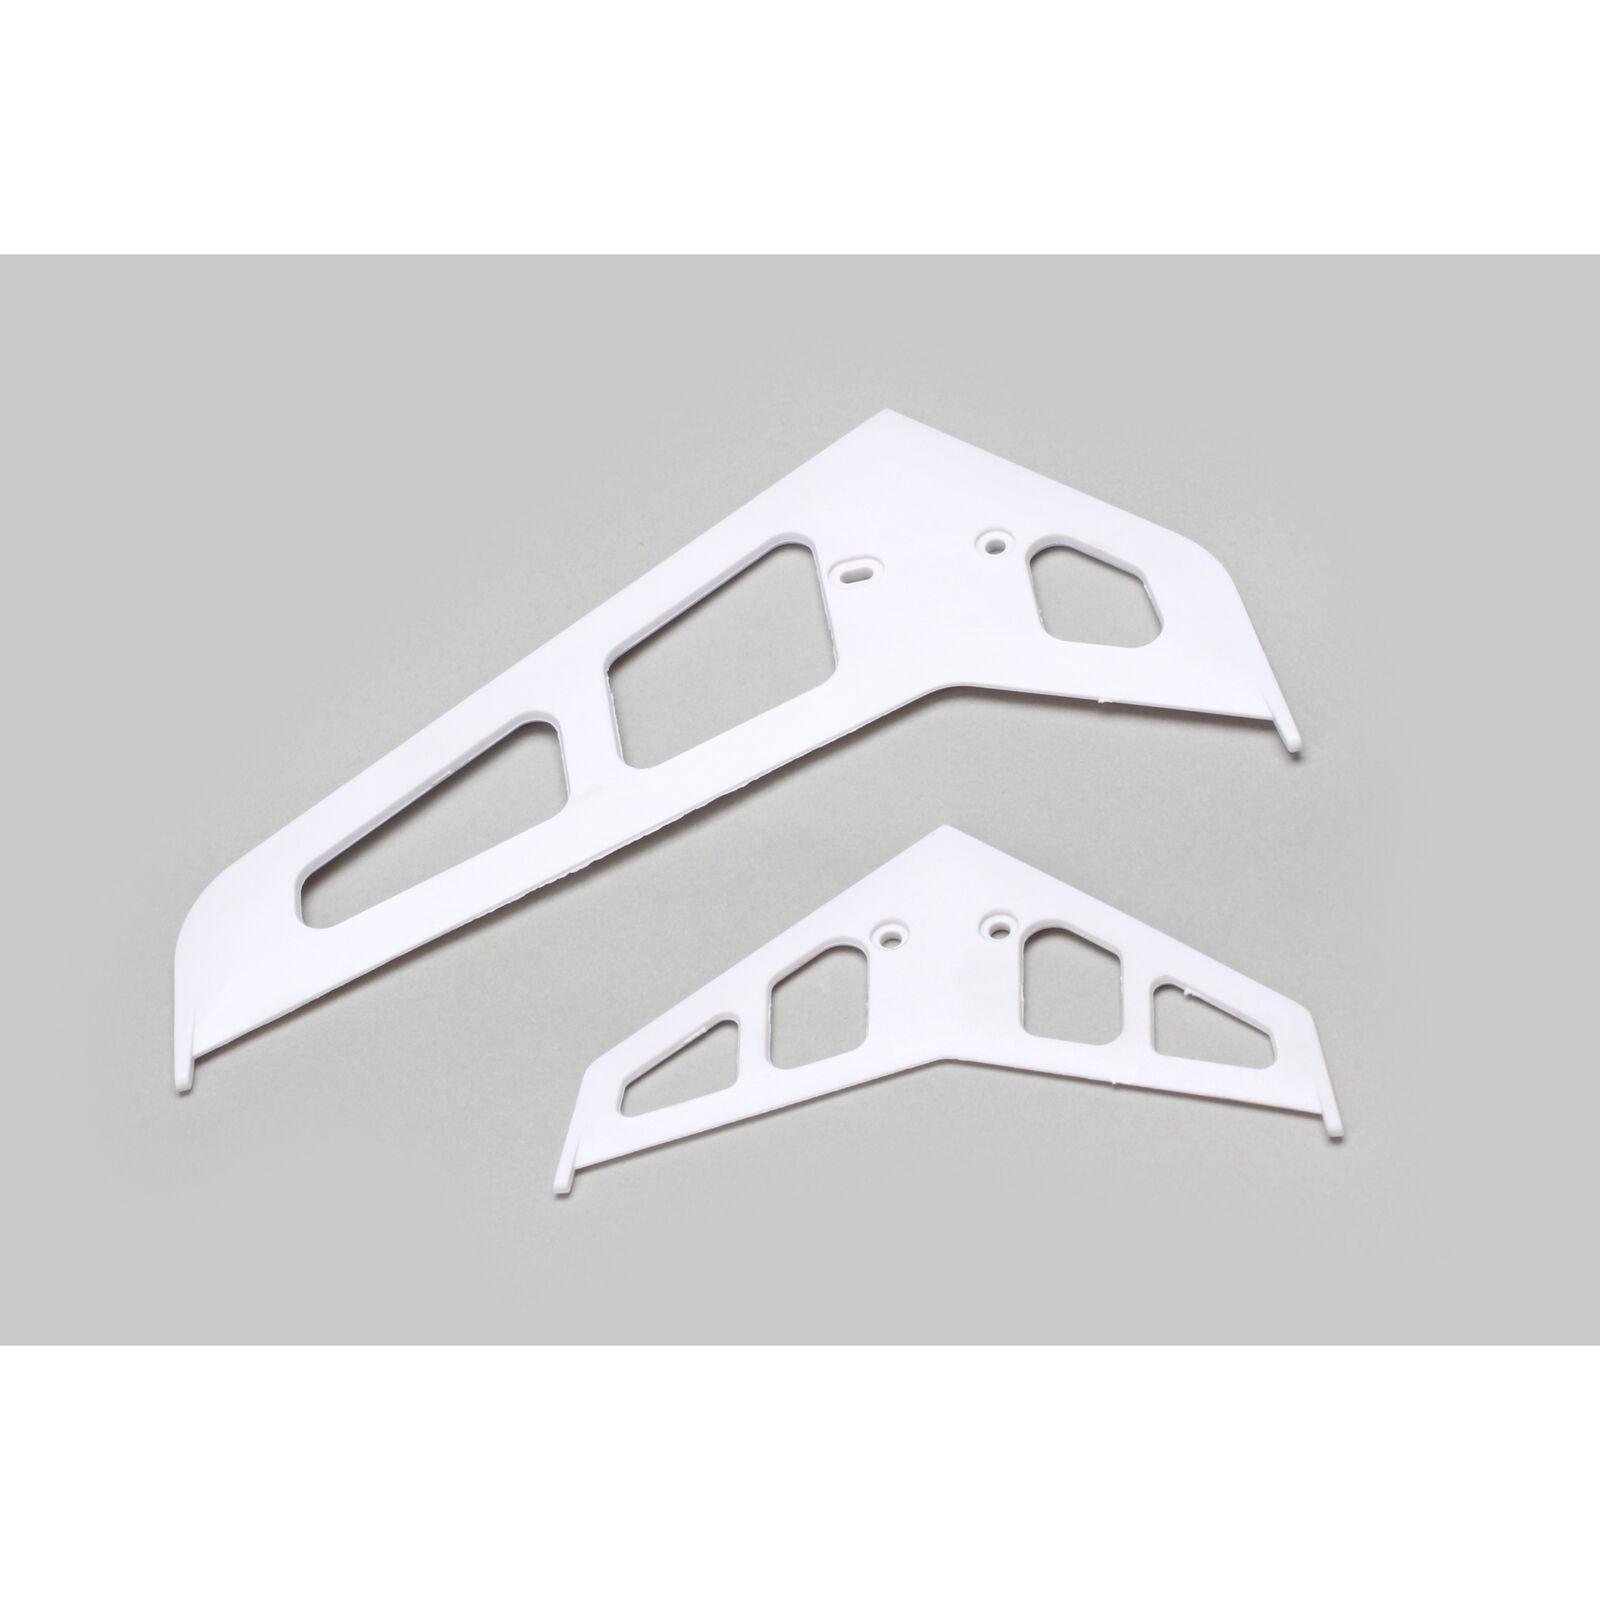 Stabilizer Fin Set White: B500 3D/X